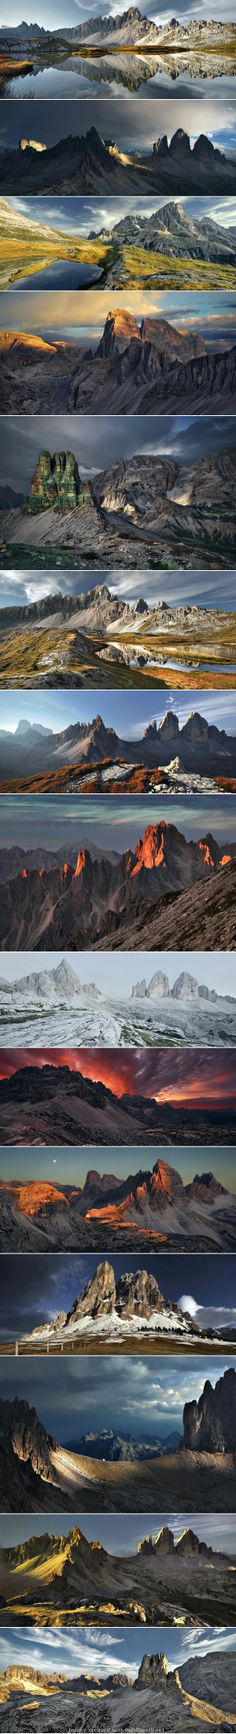 Landscape mountains photography dolomites